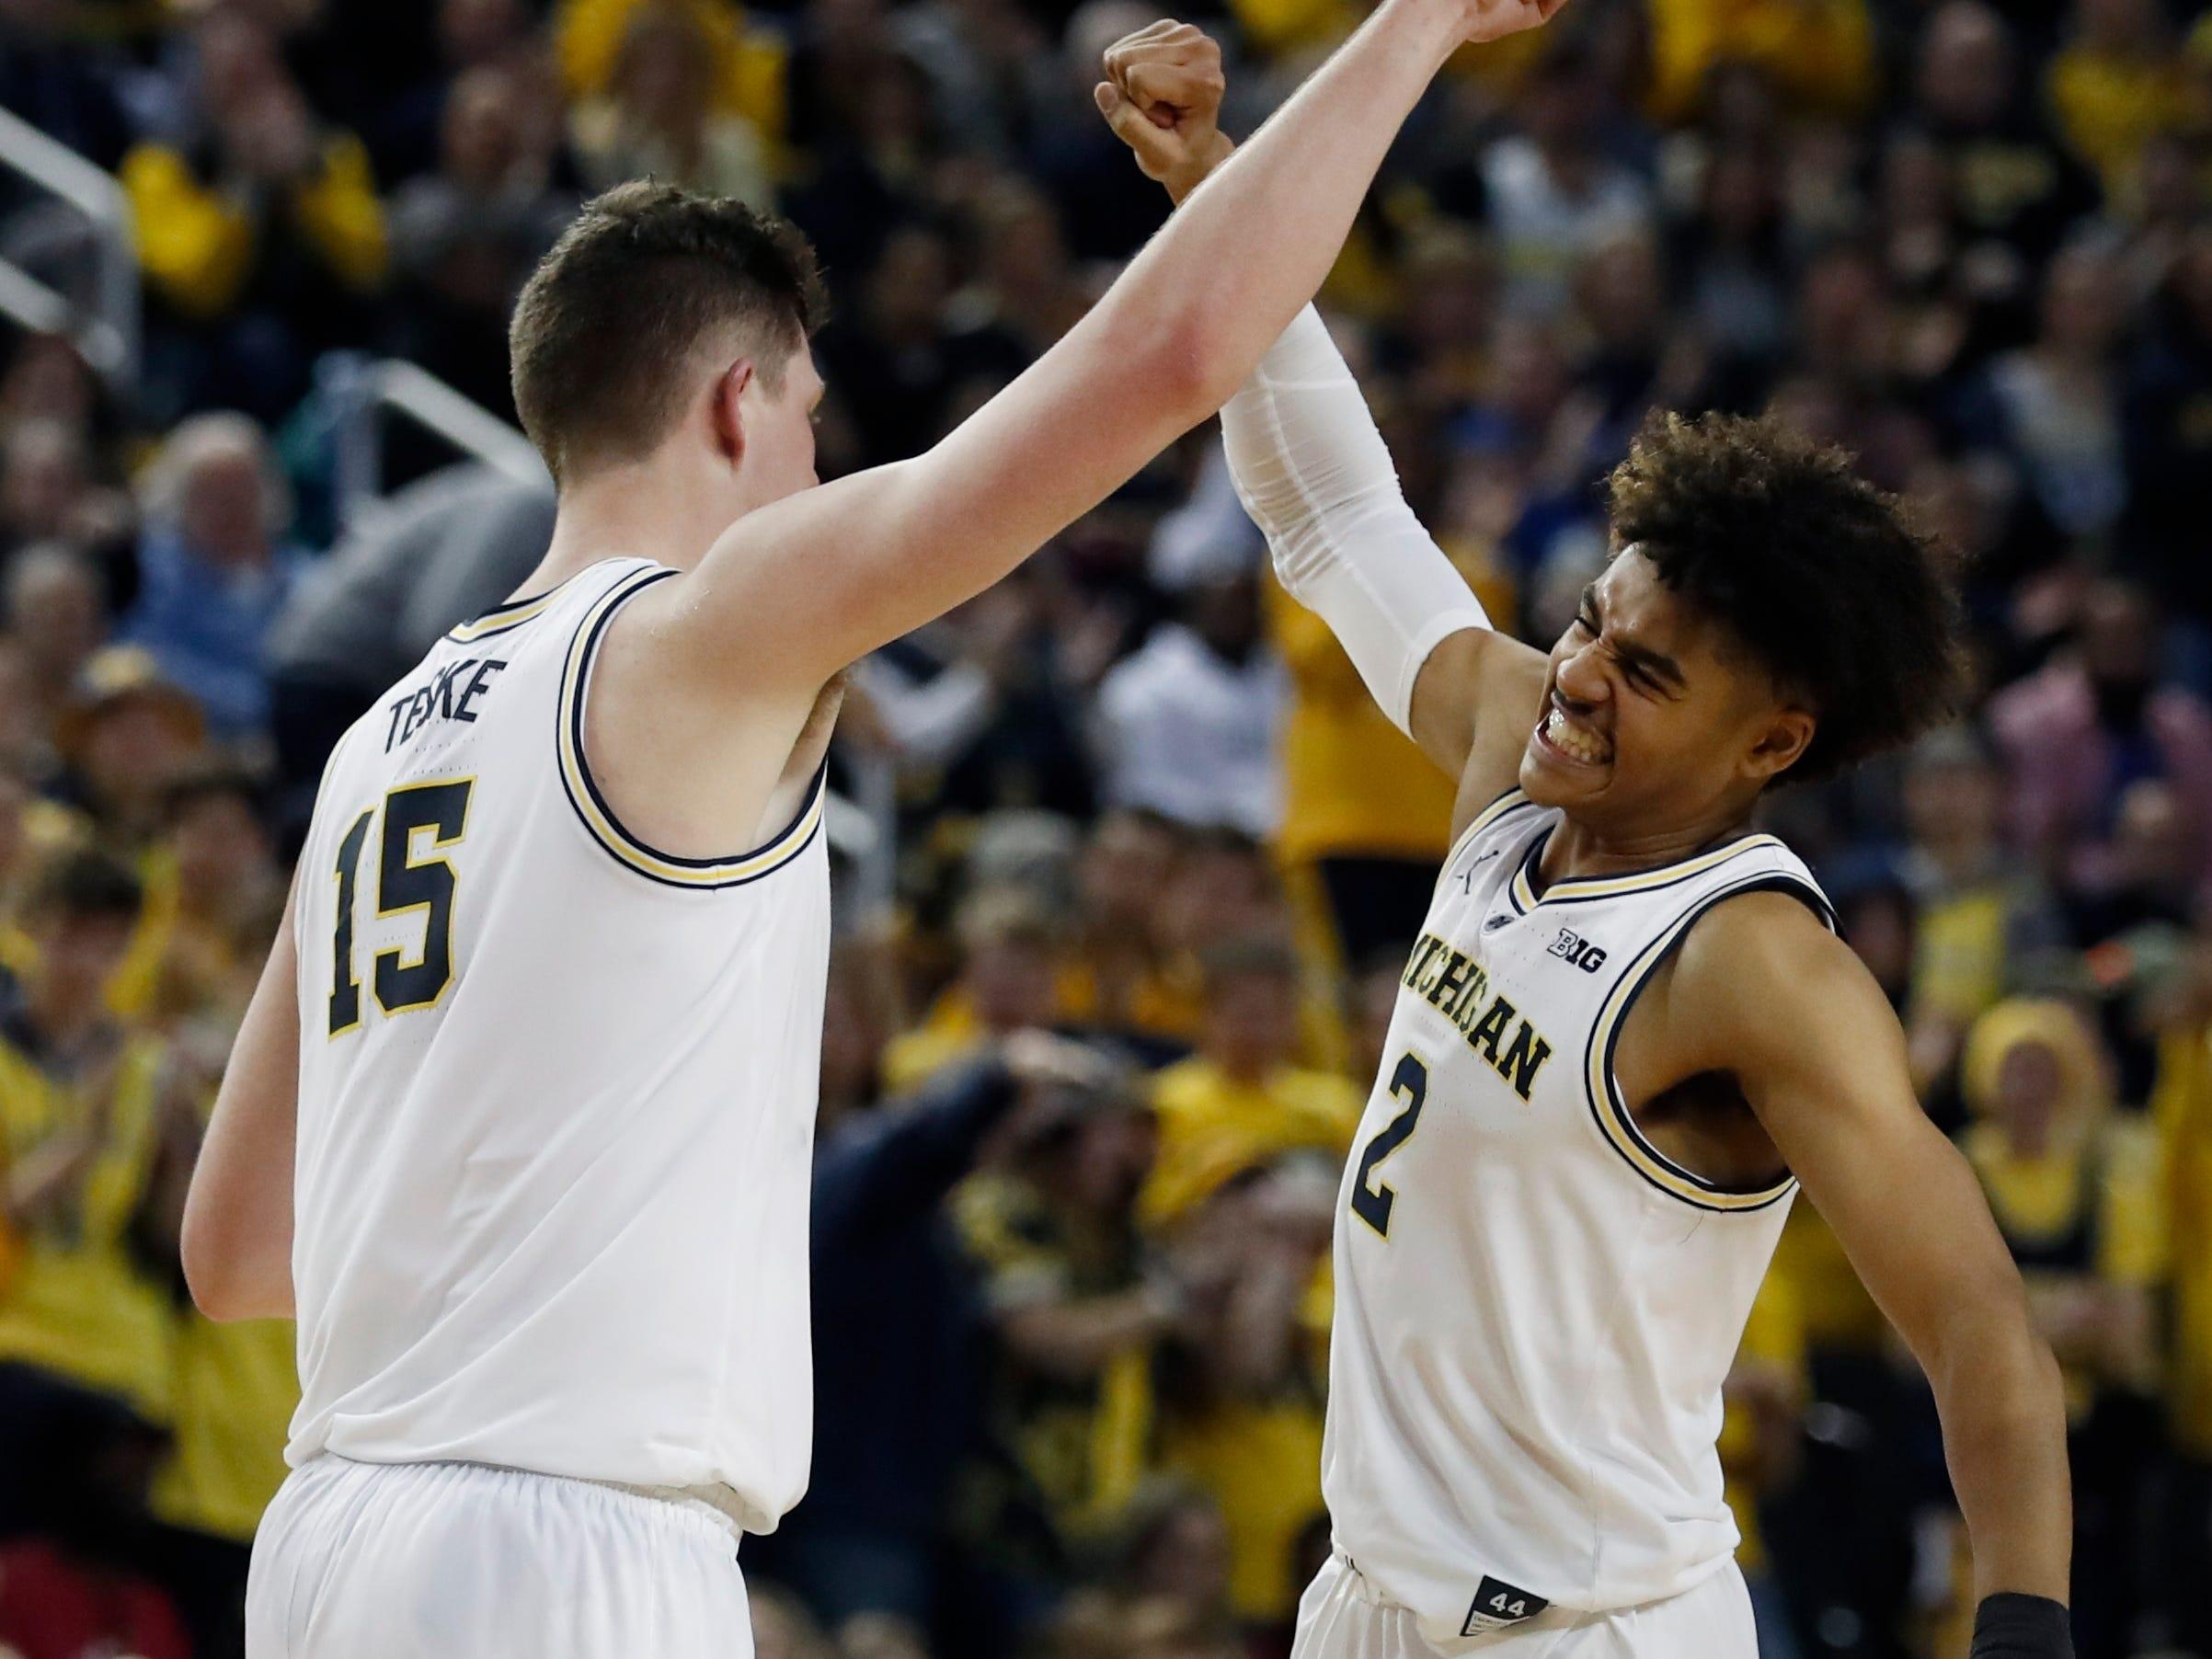 Michigan center Jon Teske (left) and guard Jordan Poole celebrate a basket in the second half.